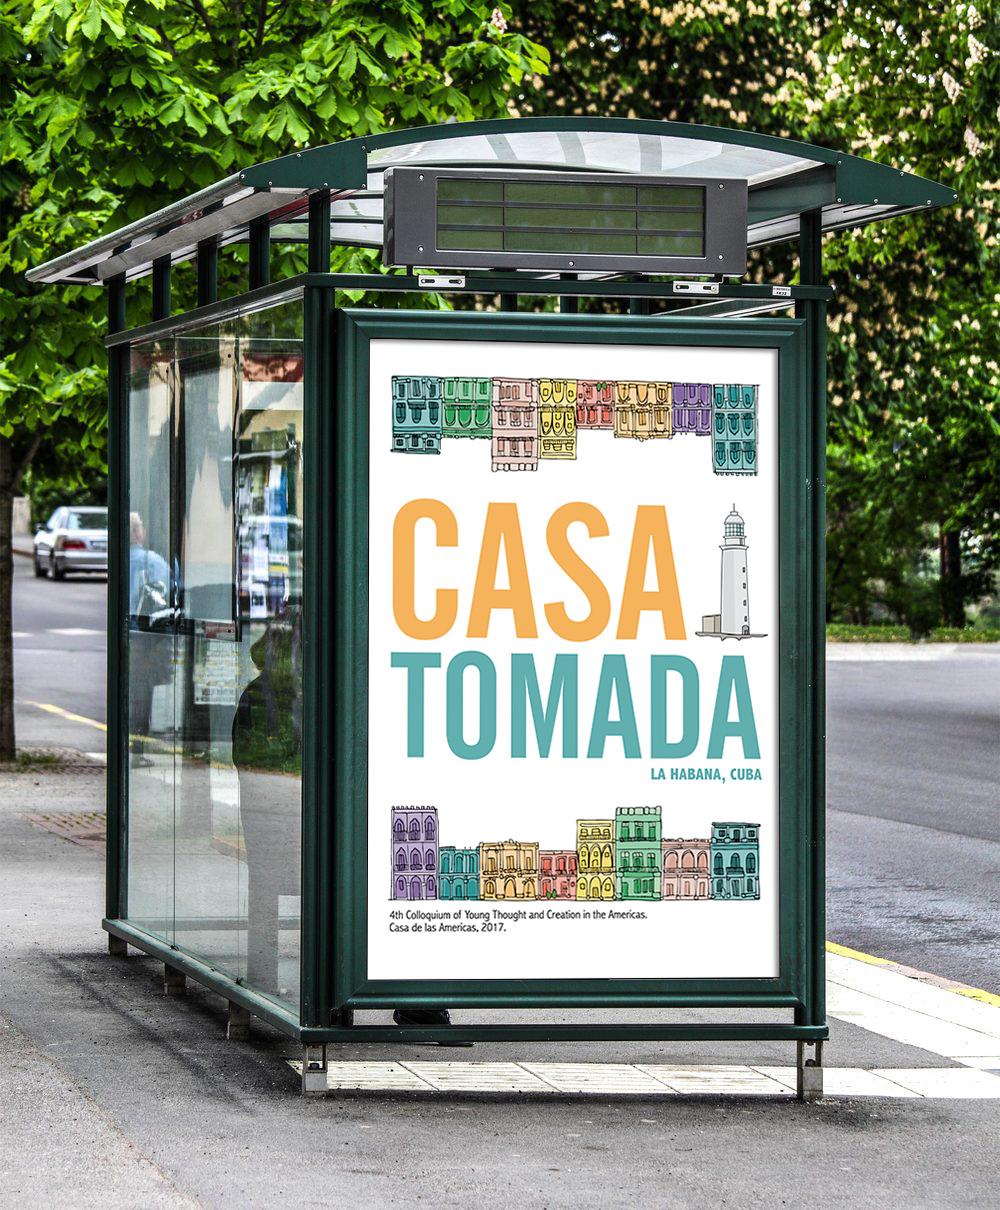 Casa Tomada - Cuban festival poster